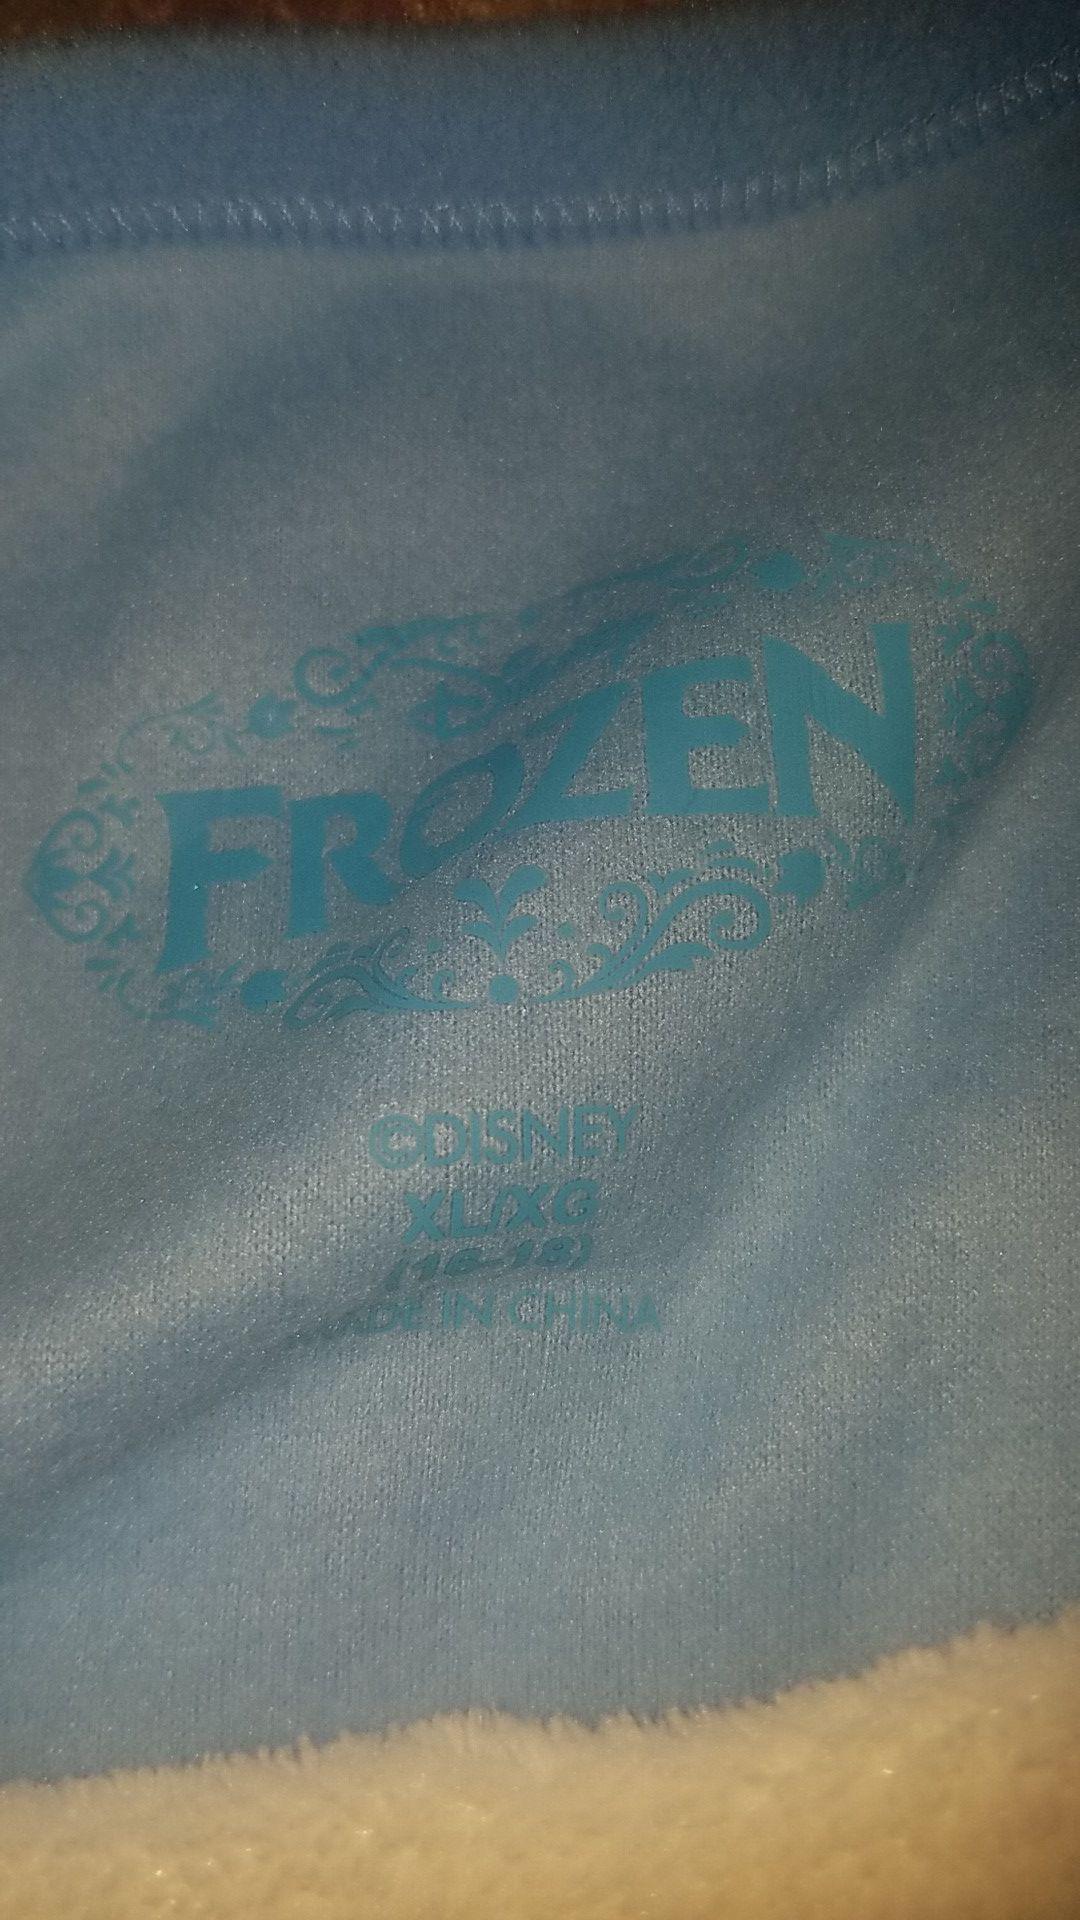 Frozen olaf pj shirt